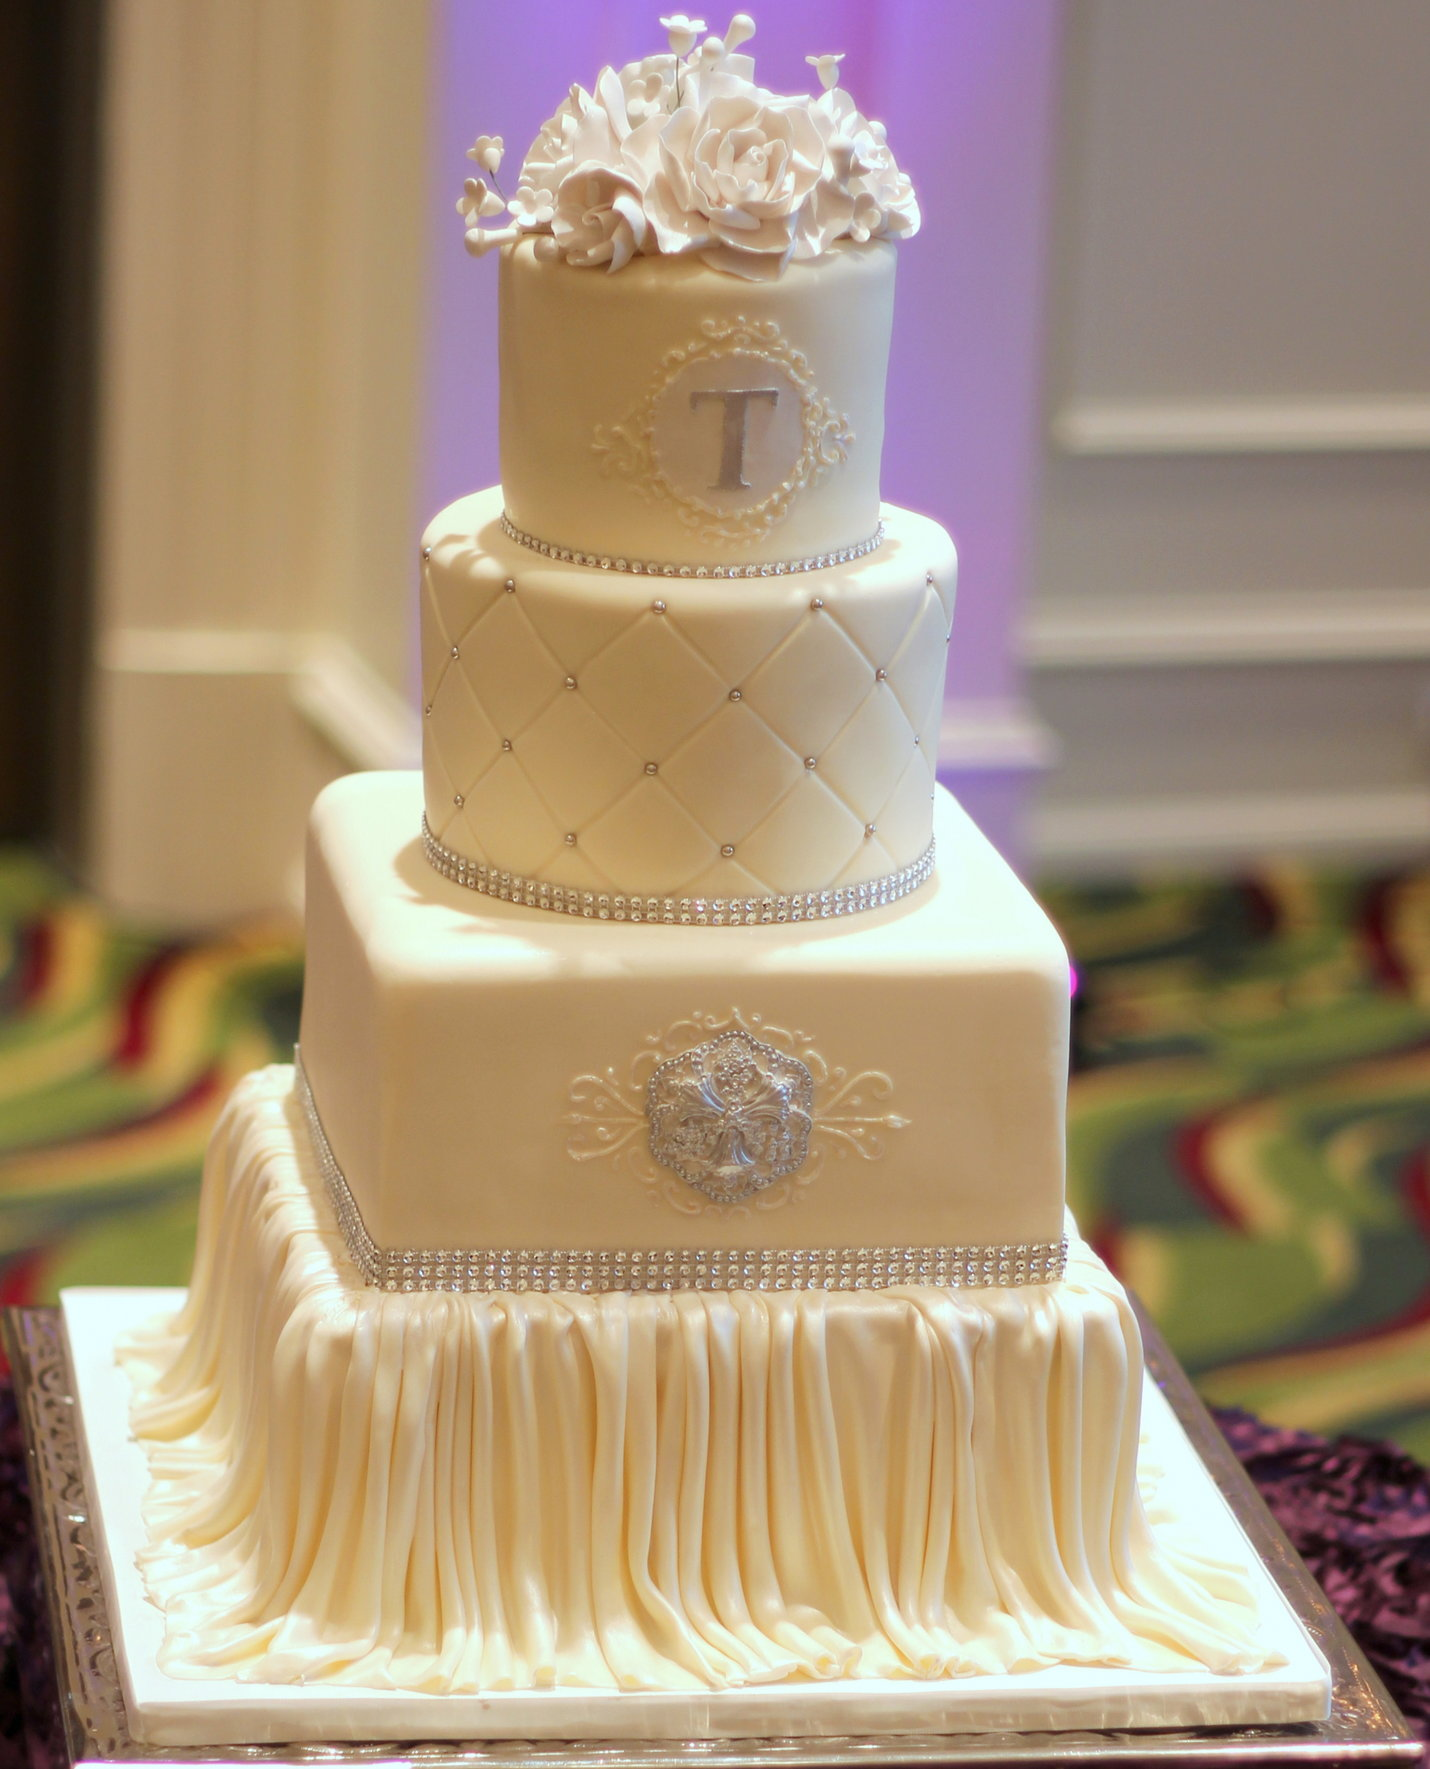 Beautiful fresh flowers on wedding cakes - Wedding Cakes Archives Page 2 Of 3 Ambrosia Cake Creations